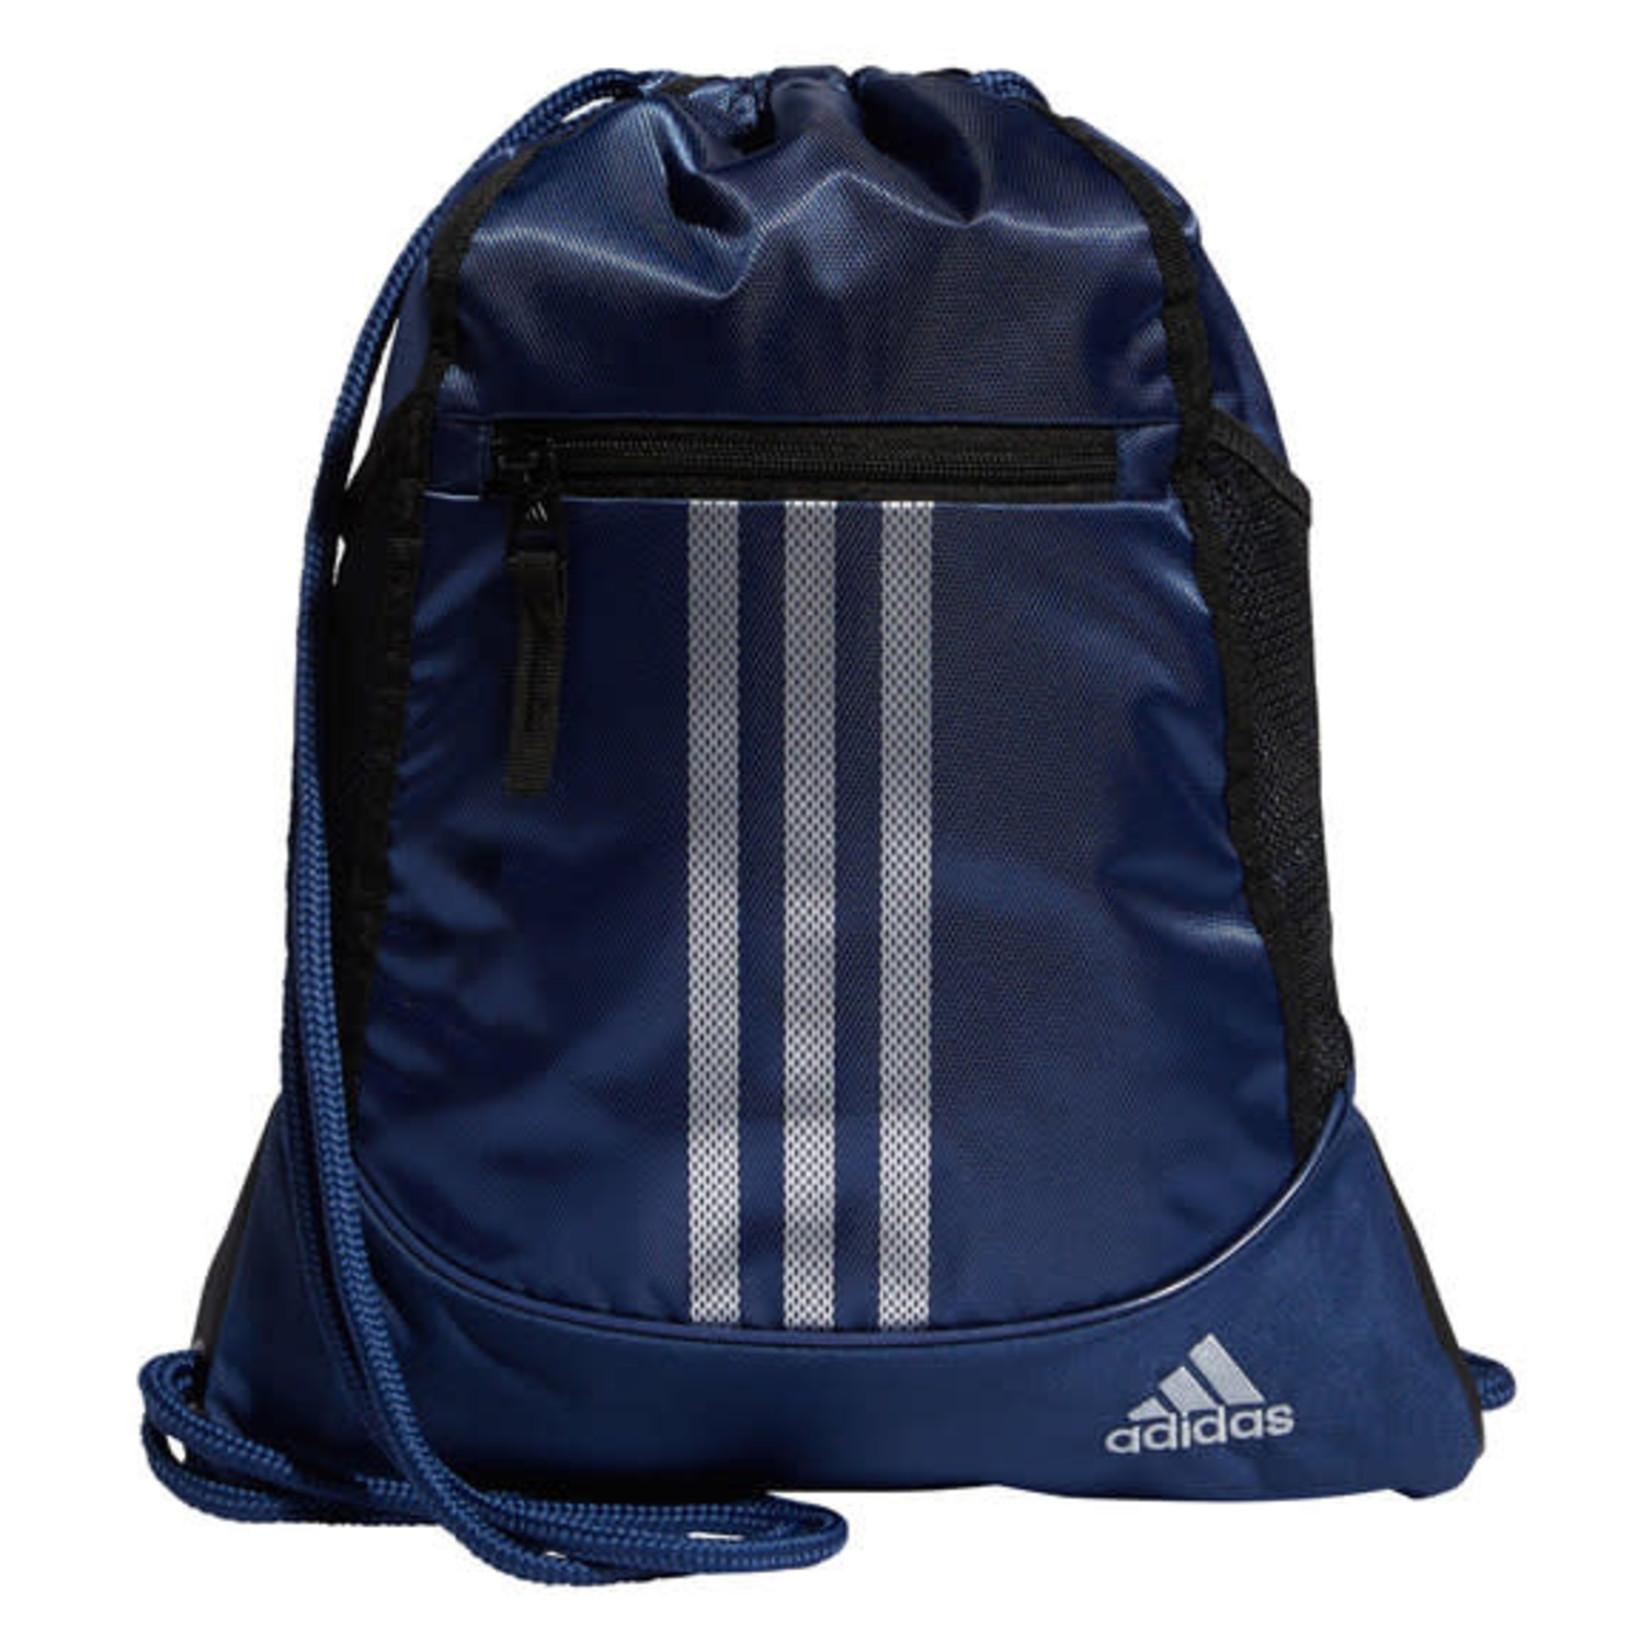 Adidas Adidas Sackpack, Alliance II